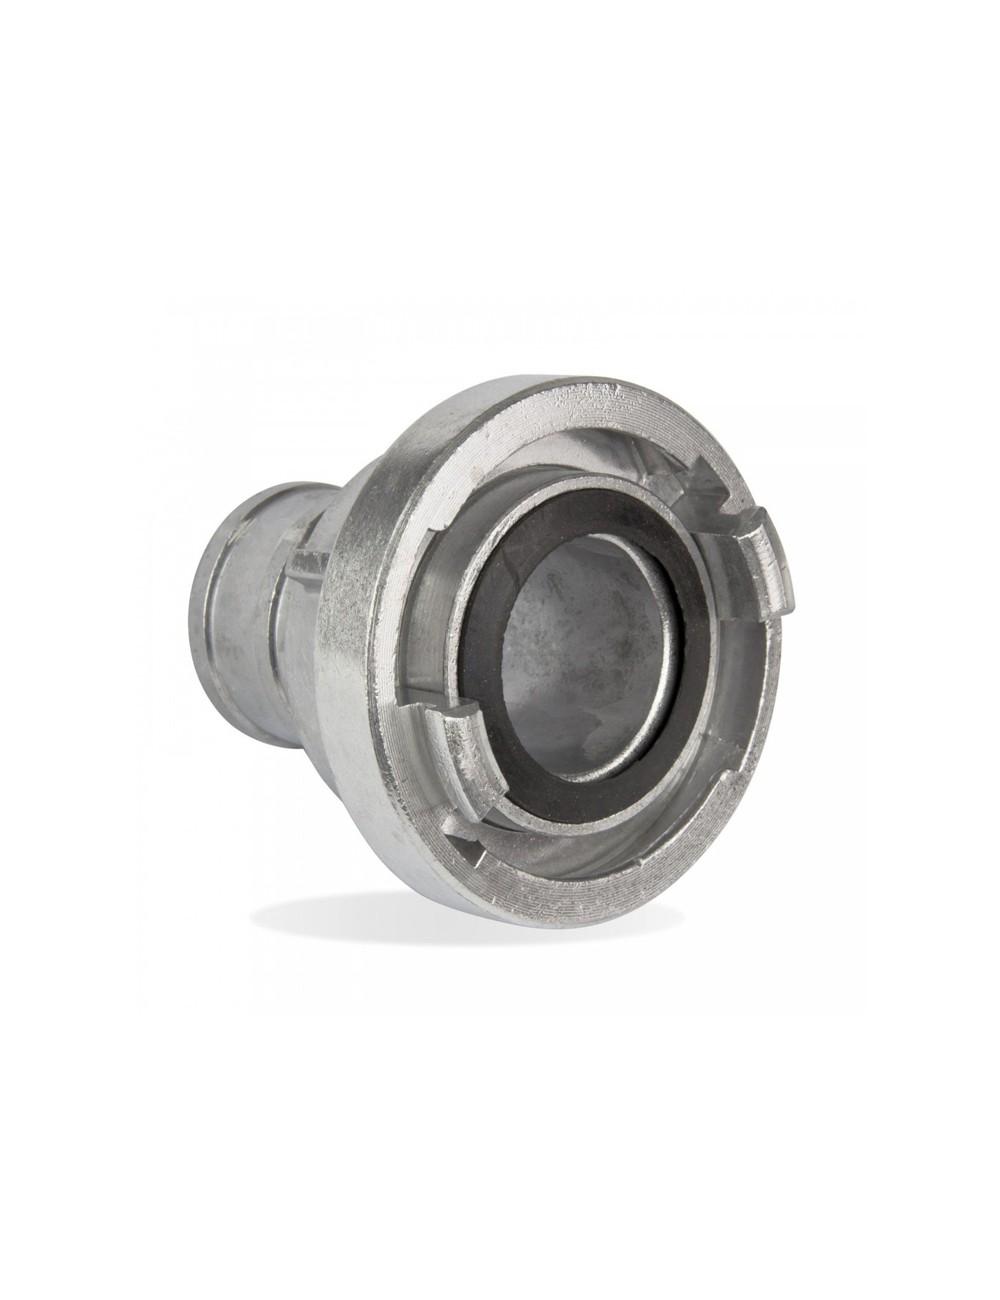 "Cupla mobila cu portfurtun (racord furtun pompieri refulare STORZ) - tip B, 3"" - 90mm"